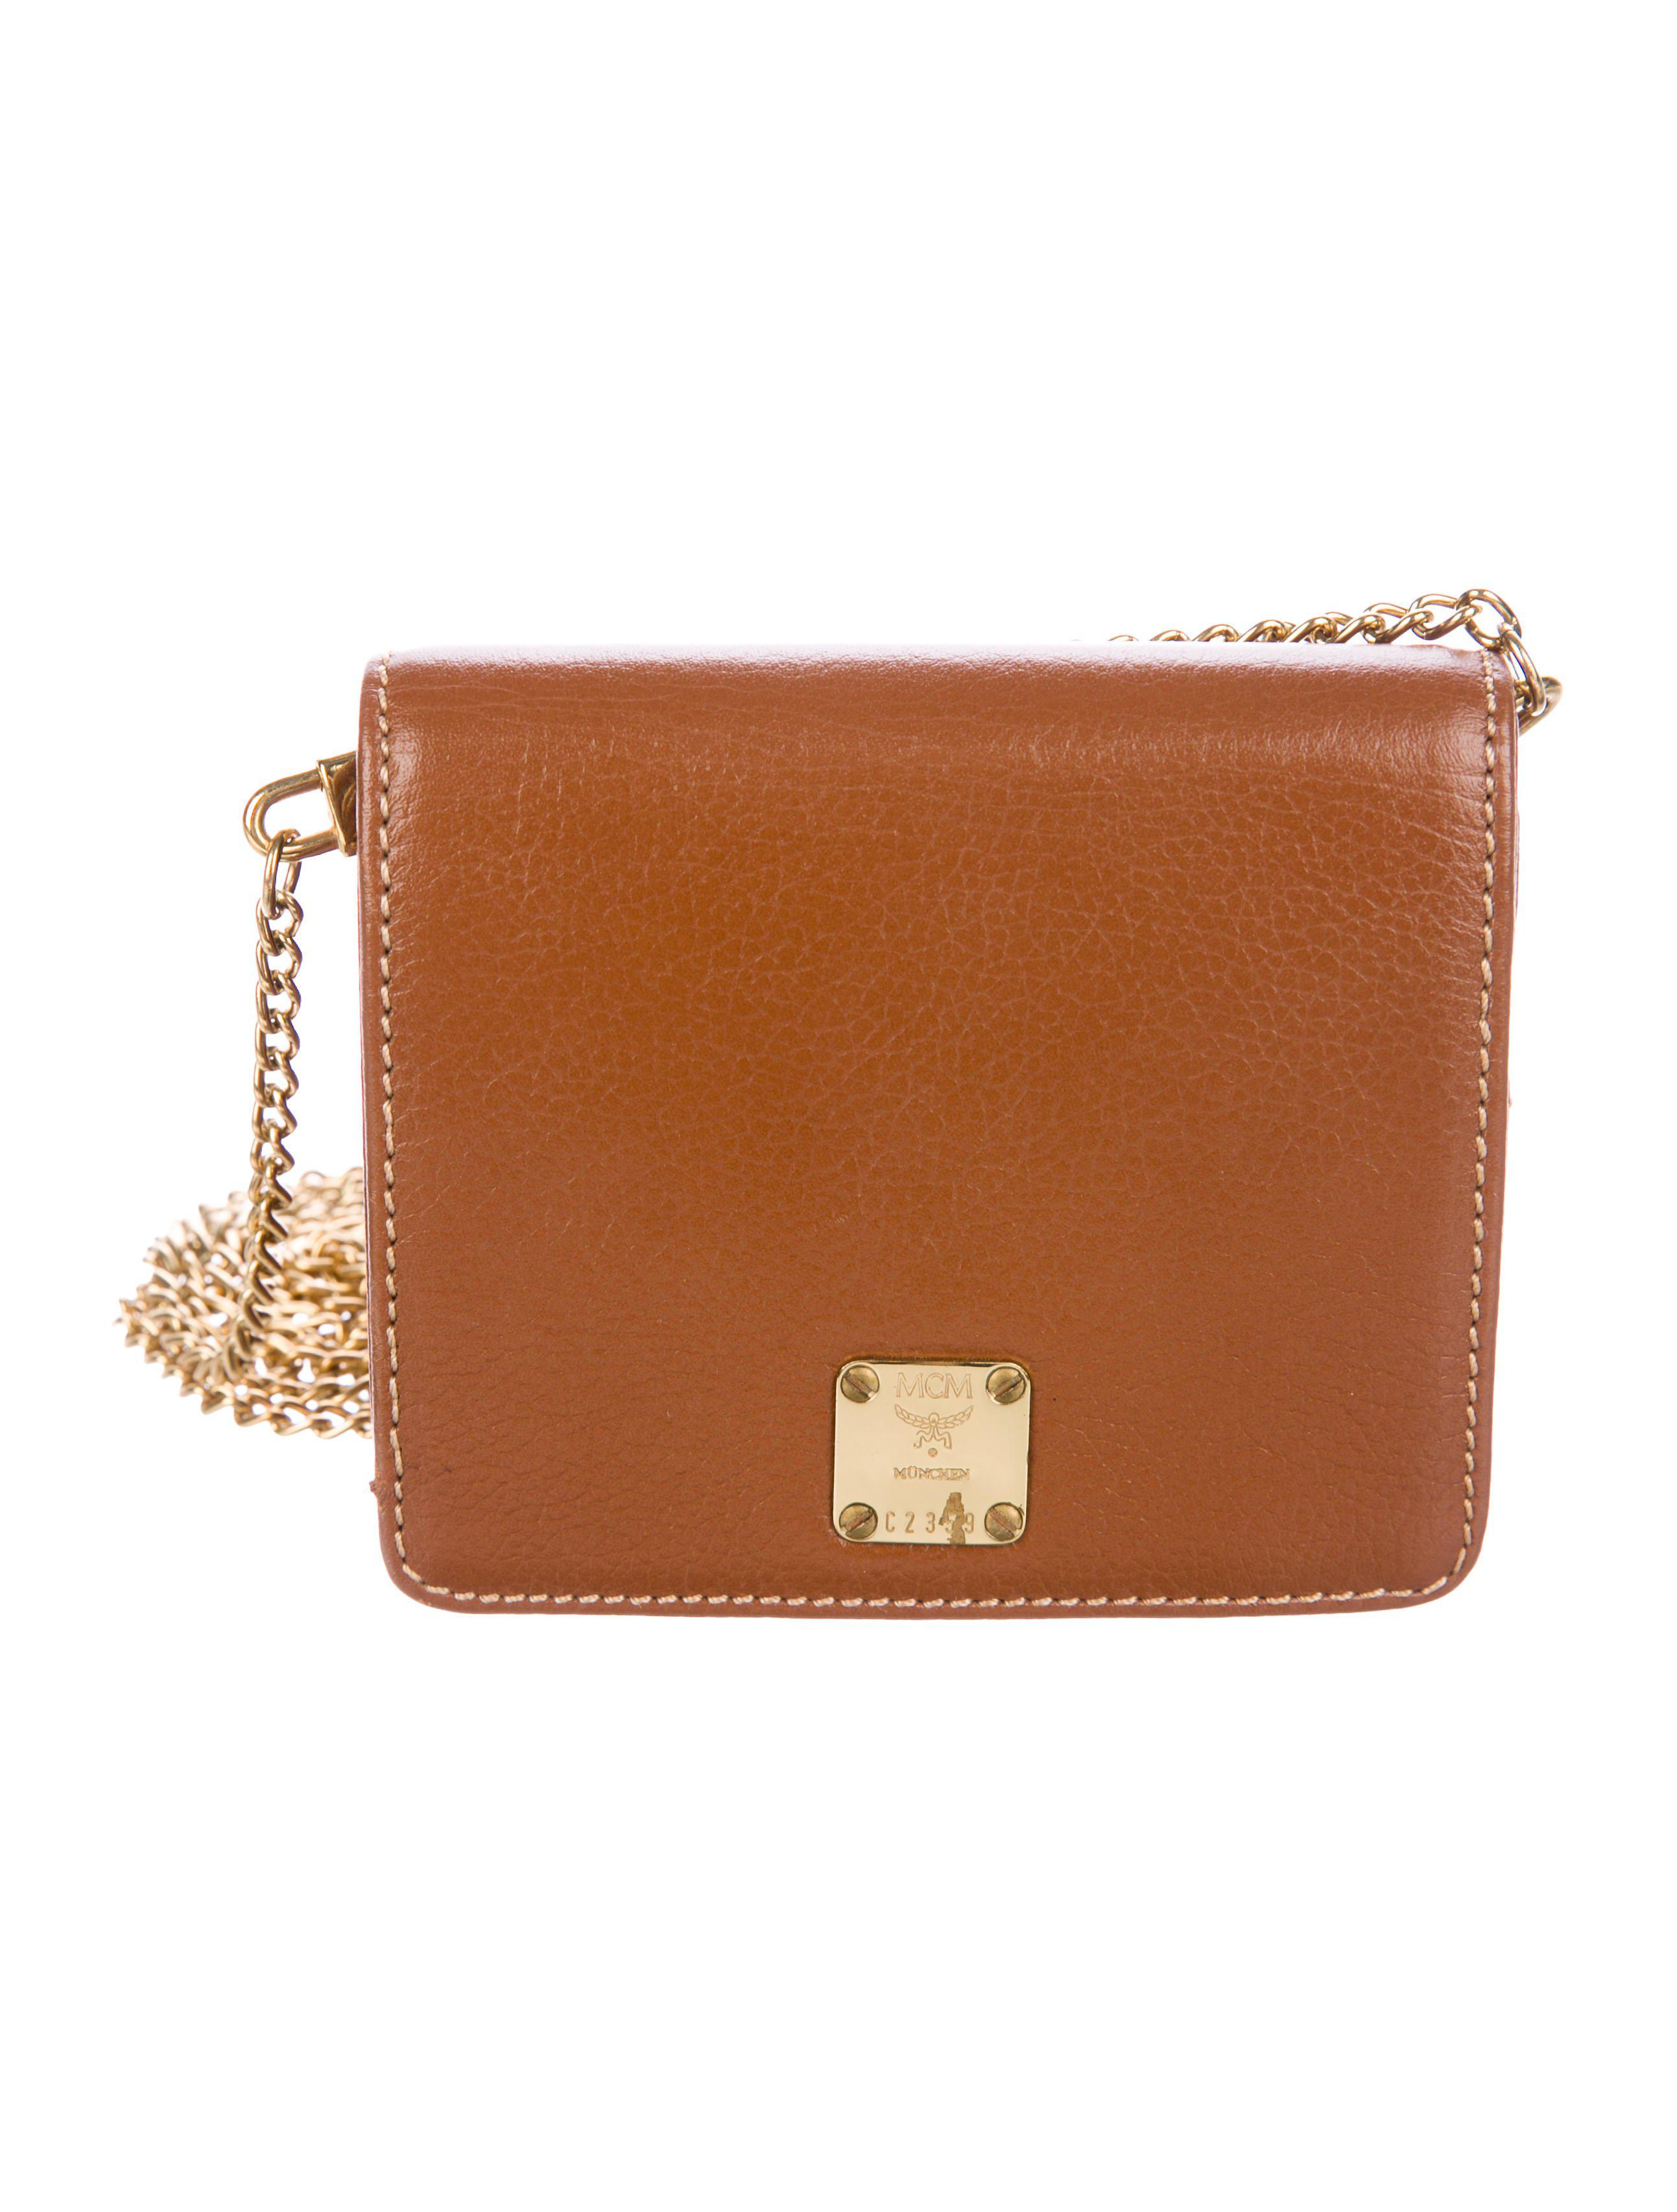 c57333ee0674 MCM - Metallic Mini Leather Crossbody Bag Brown - Lyst. View fullscreen